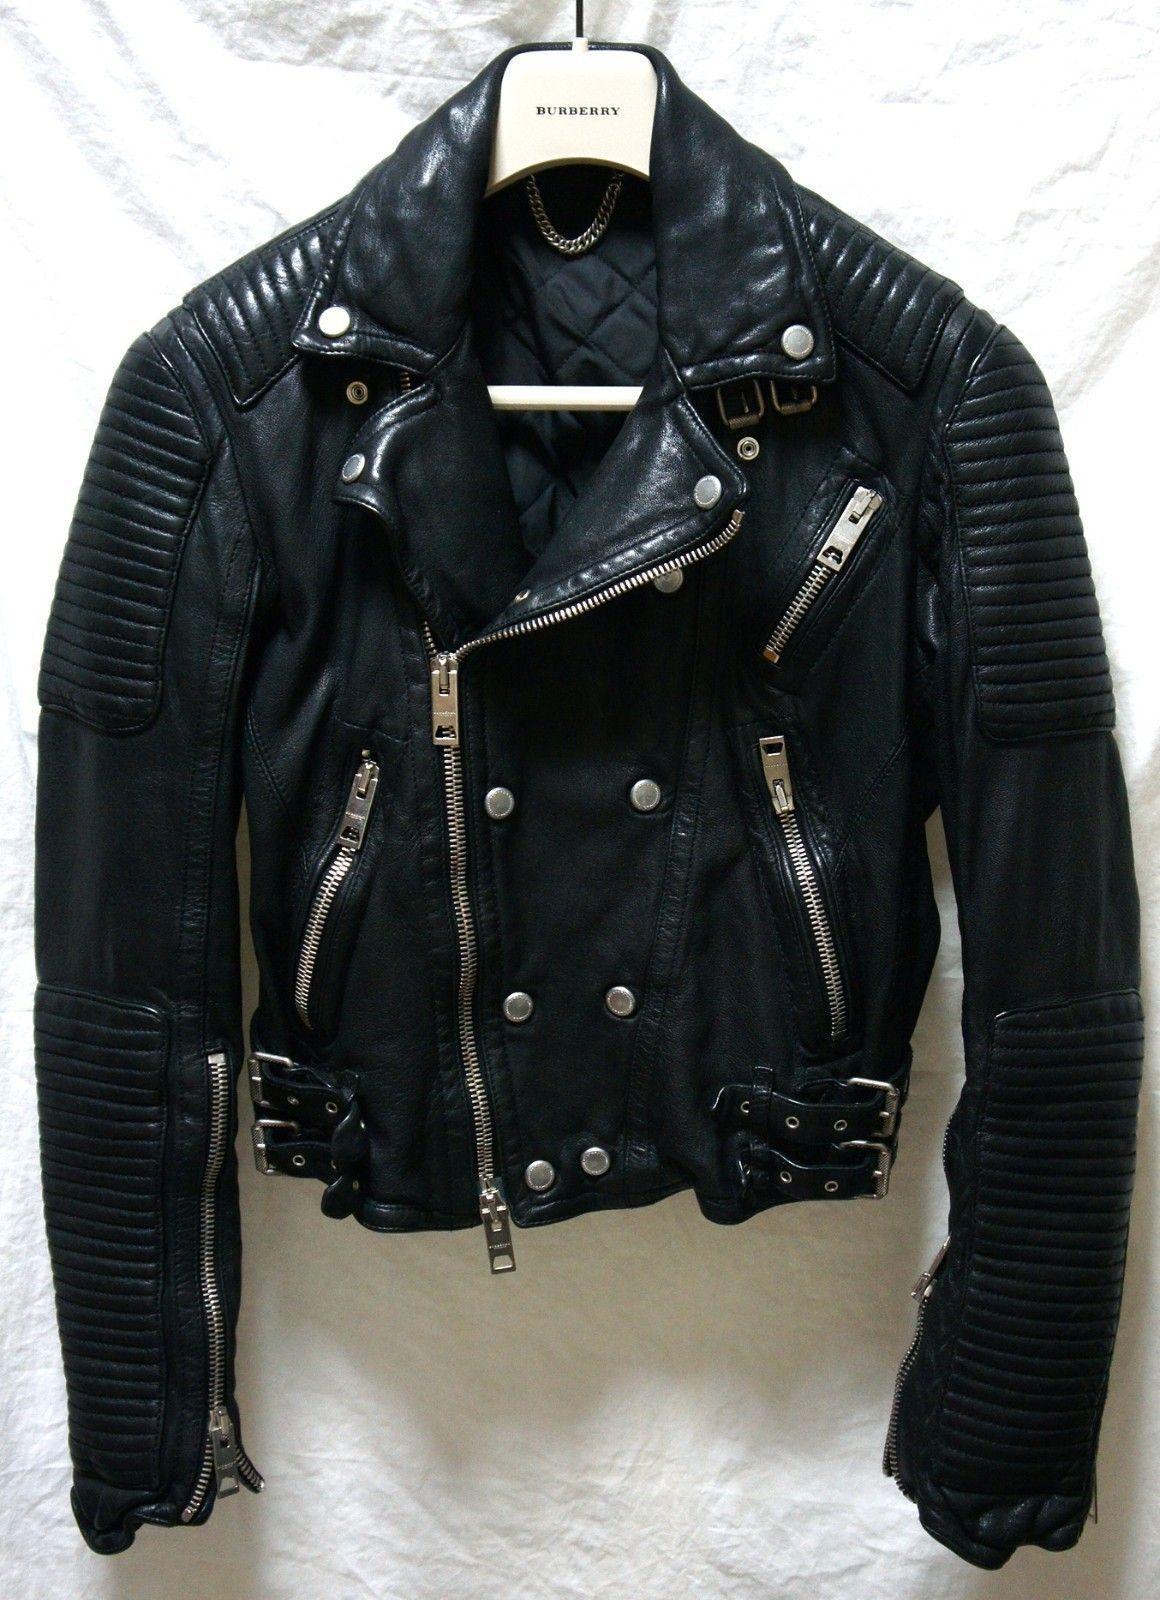 Burberry Prorsum Biker Jacket Leather Jacket Biker Jacket Style Leather Jacket Style [ 1600 x 1160 Pixel ]